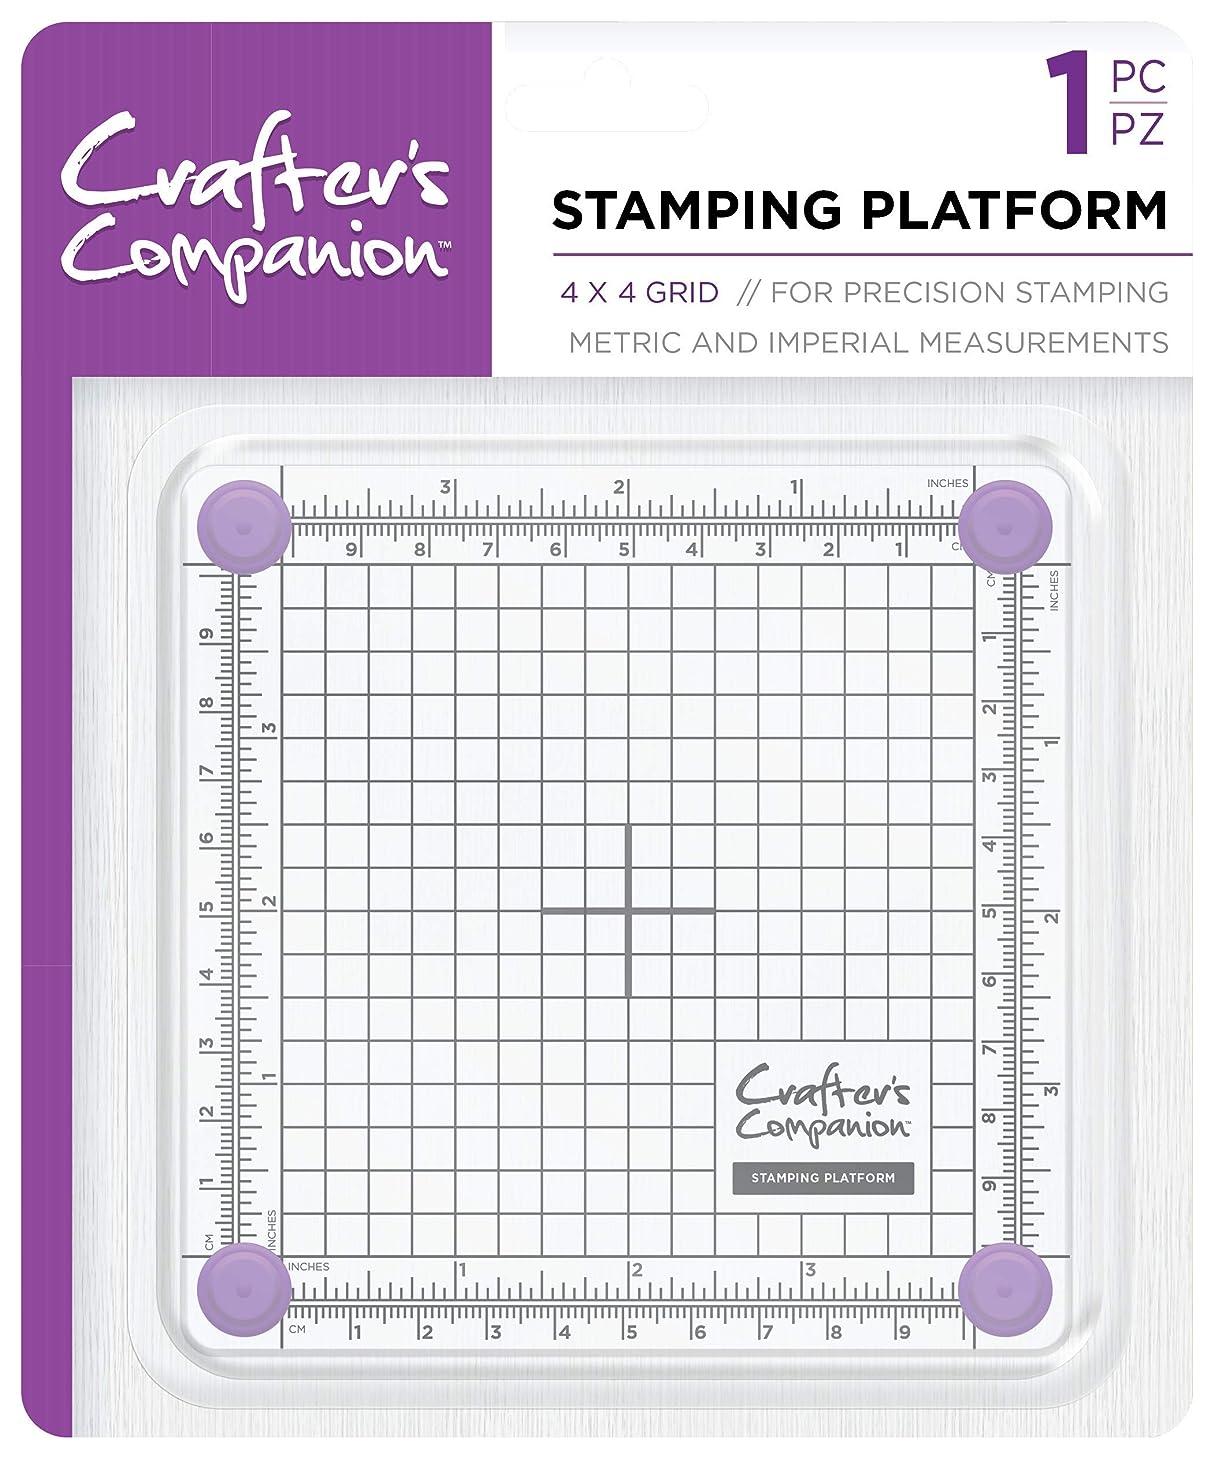 Crafter's Companion Stamping Platform-4